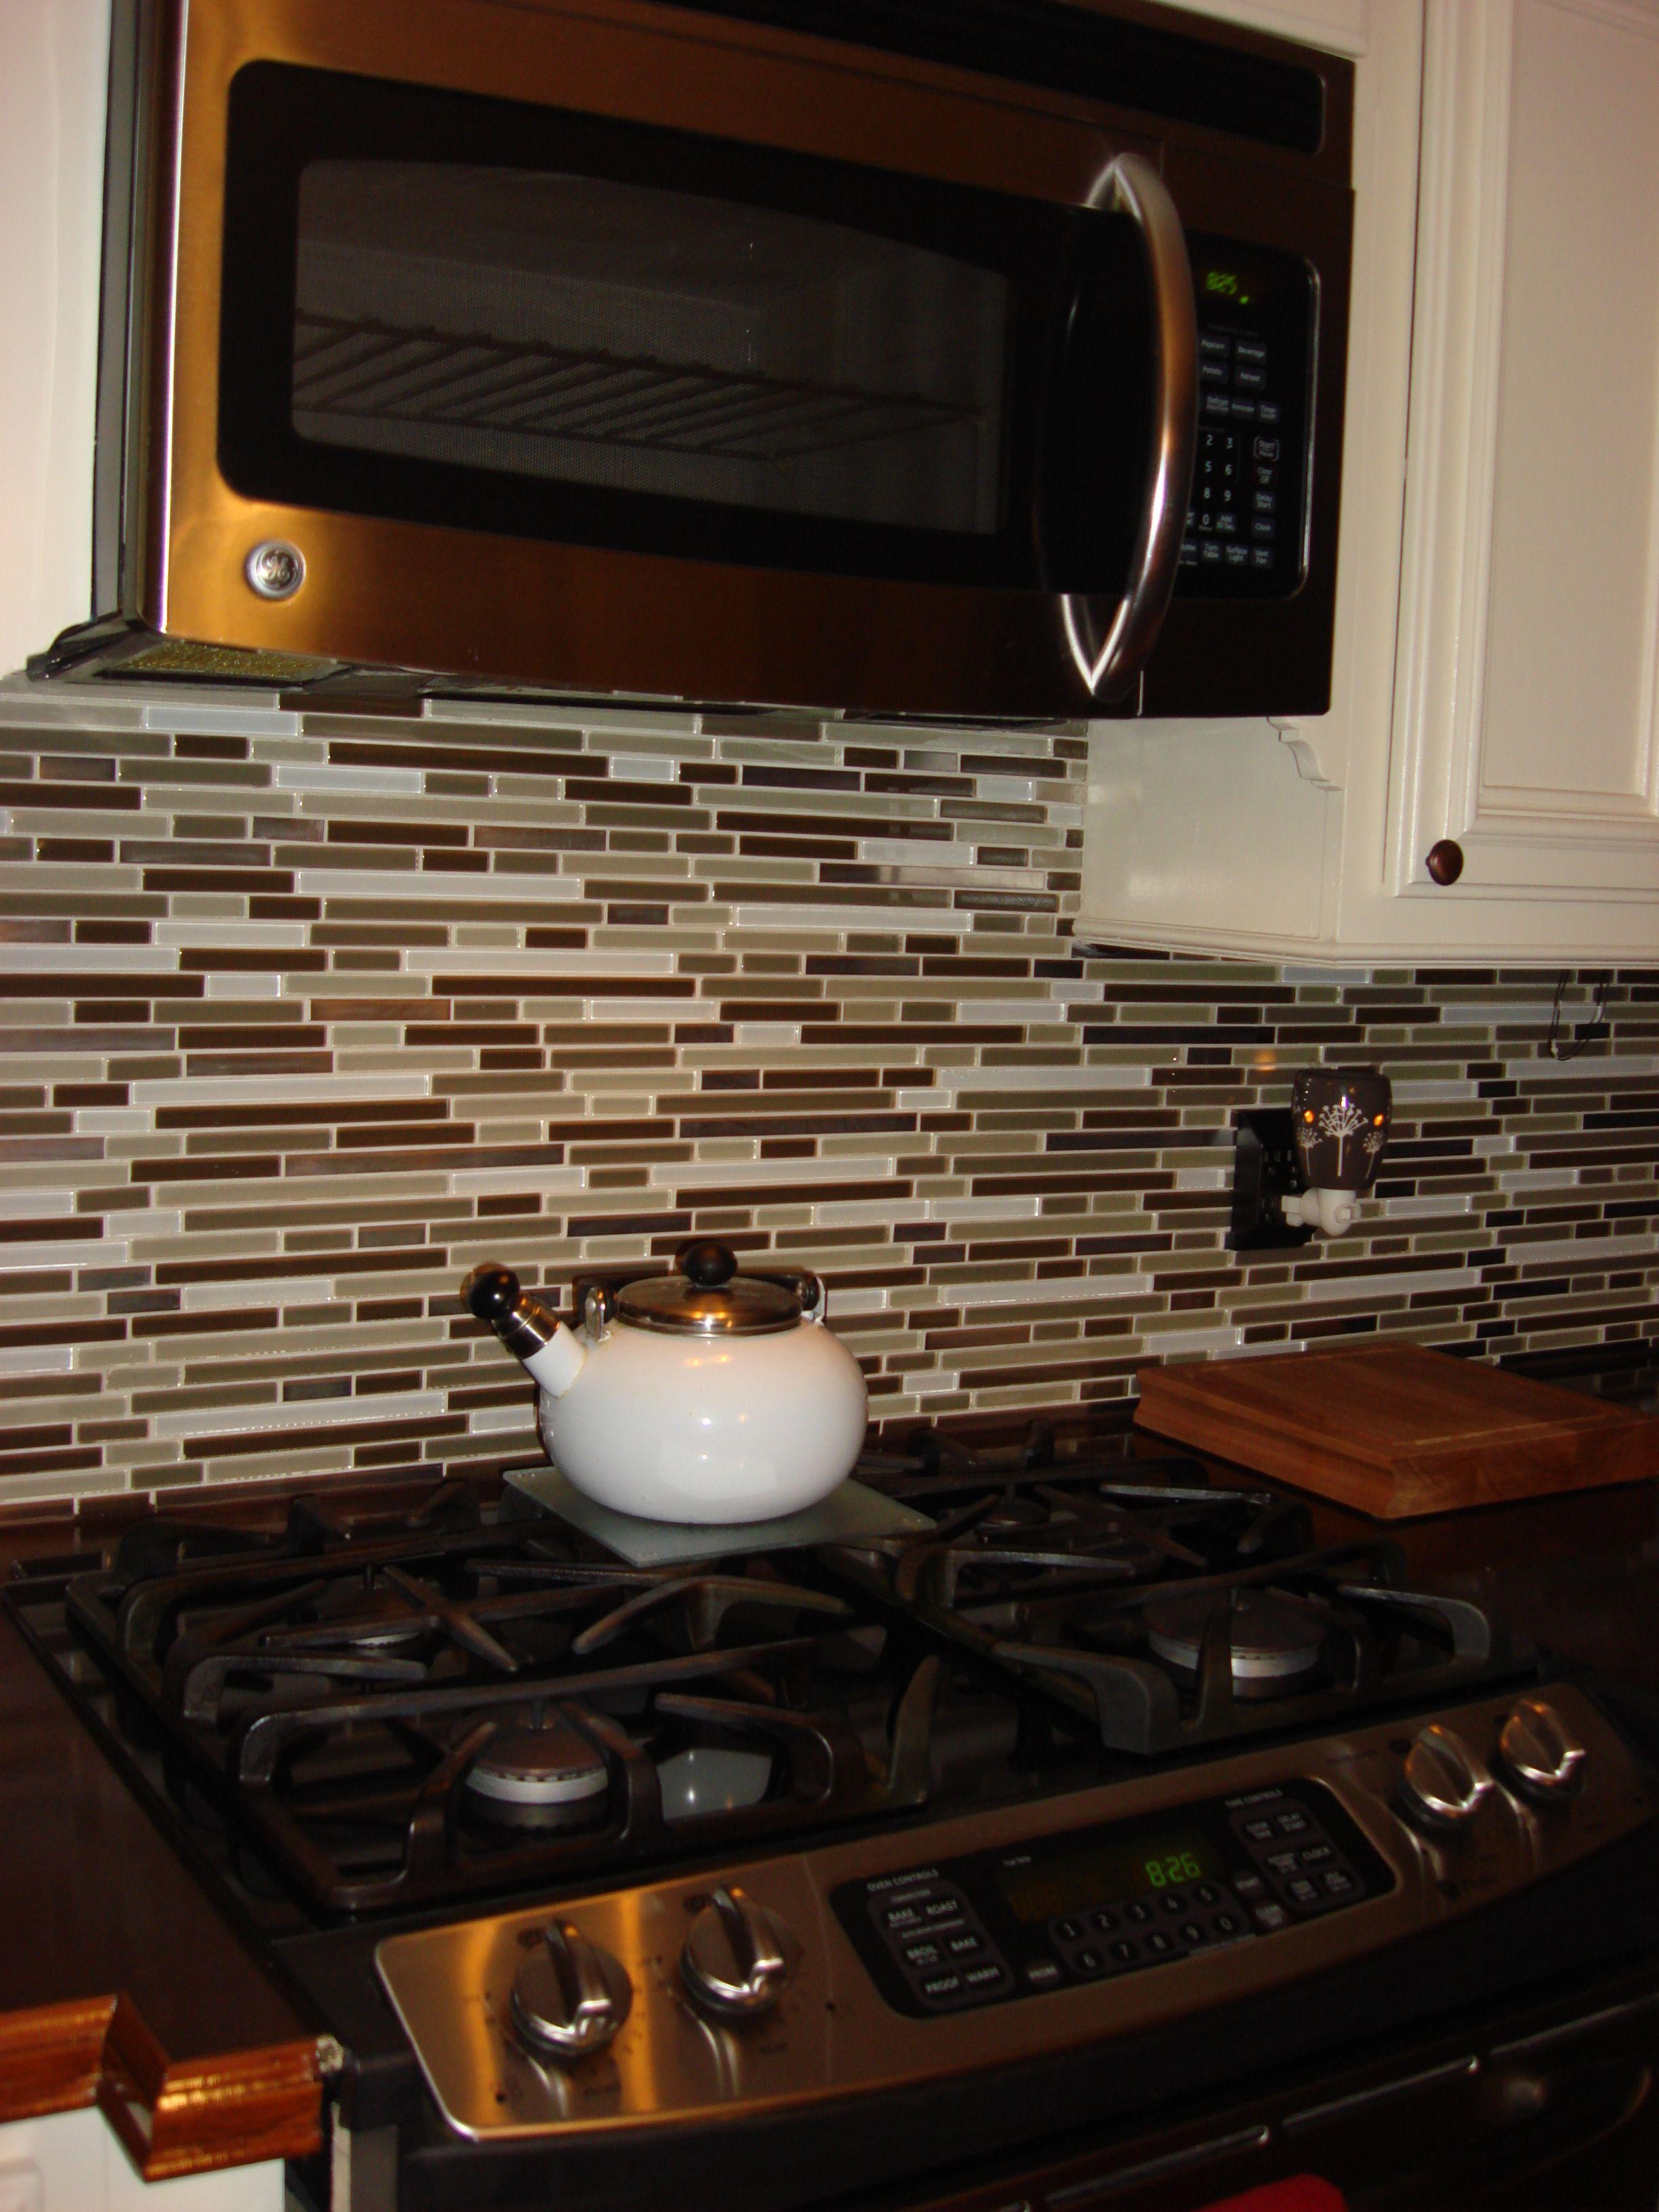 glass tile backsplash all the way up under the microwave kitchen